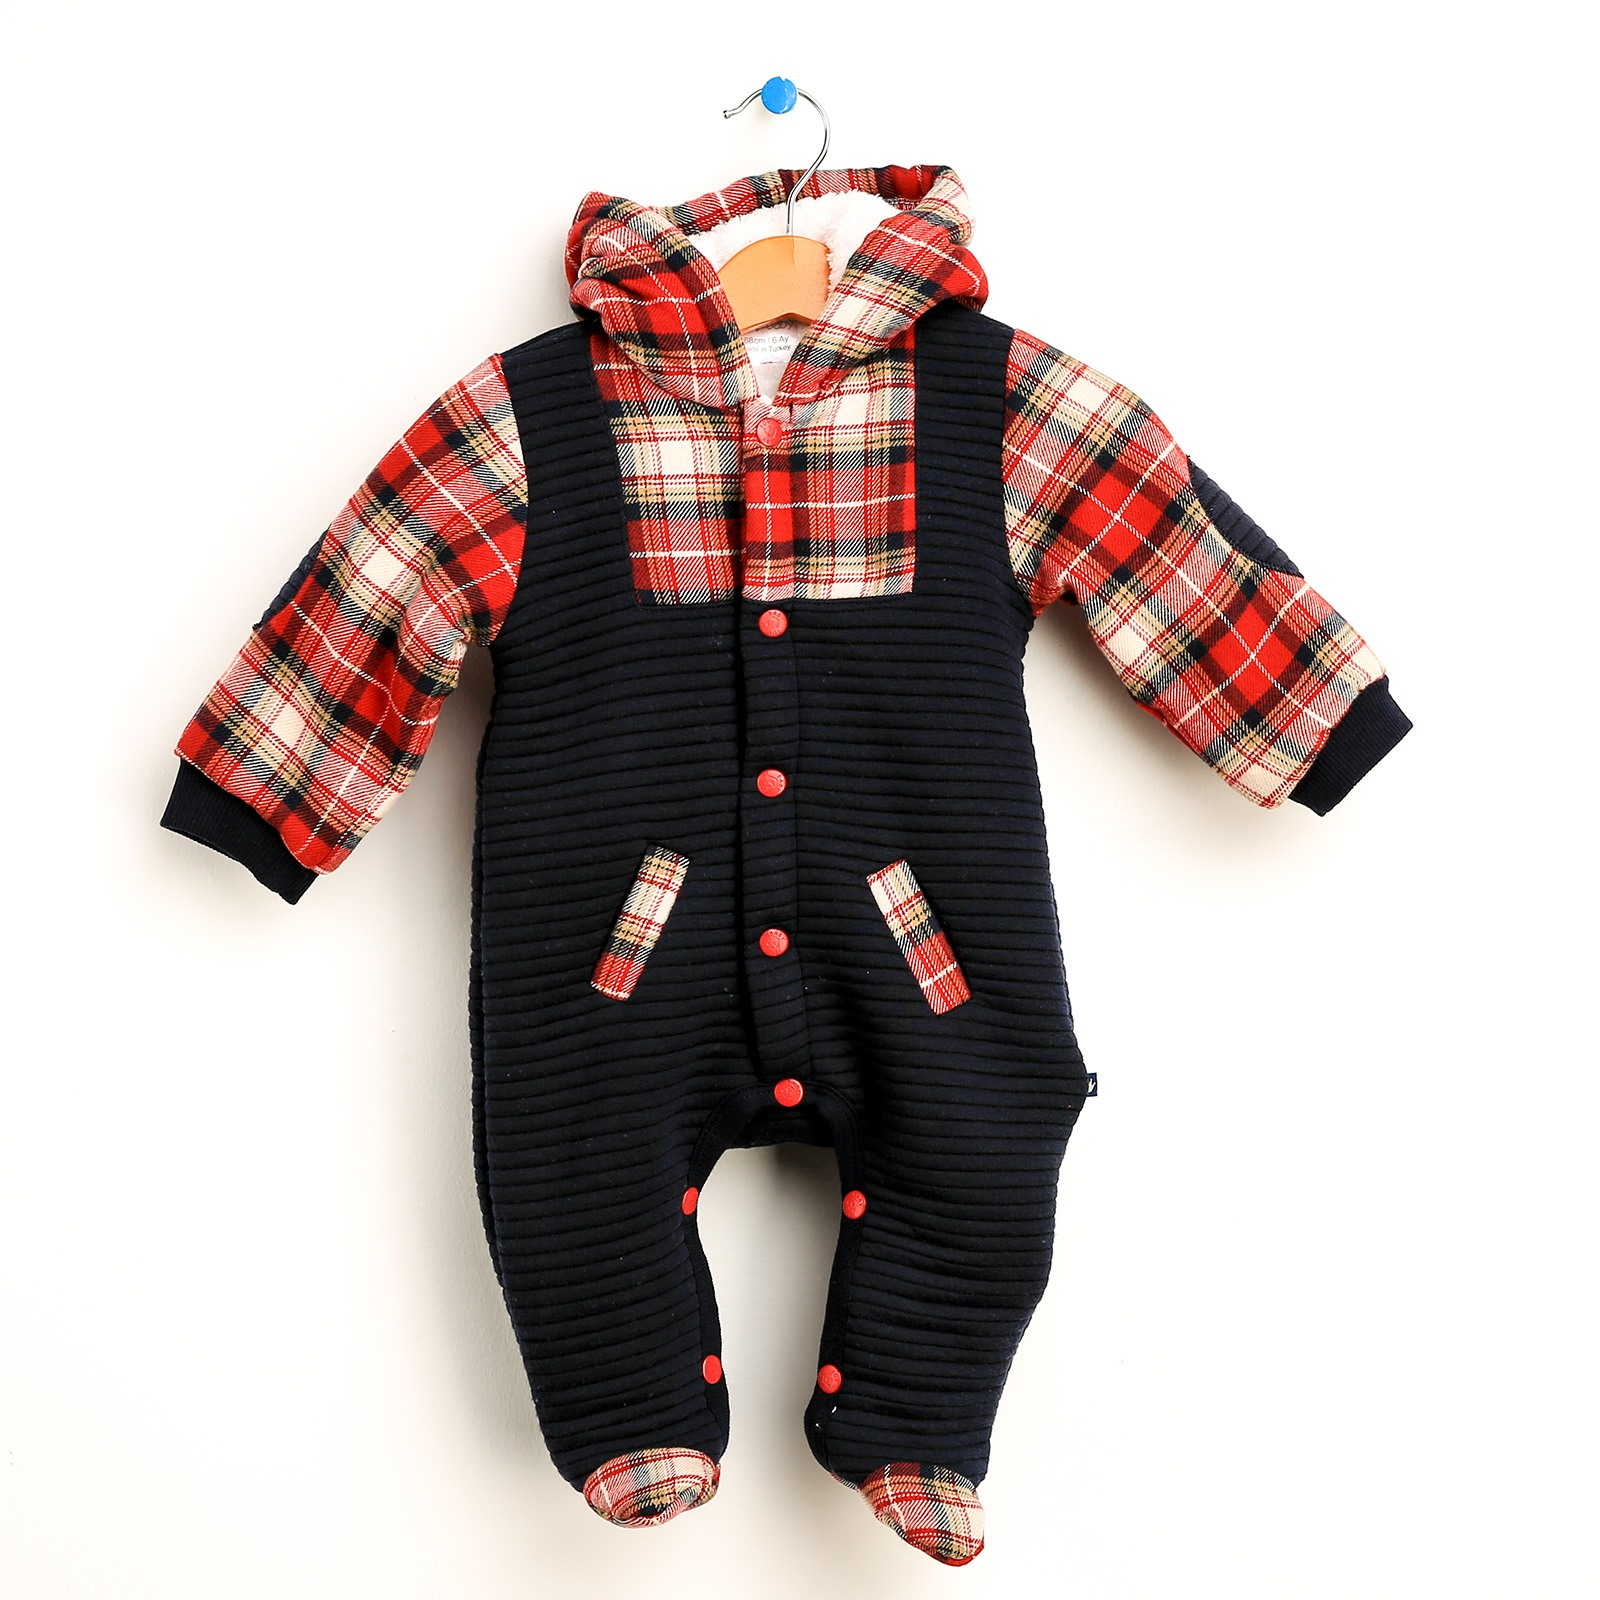 Ebebek For My Baby Boy Aristo Hoodies Long Sleeve Romper Toddler Boy Clothes Winter Christmas Vestidos Newborn Clothes